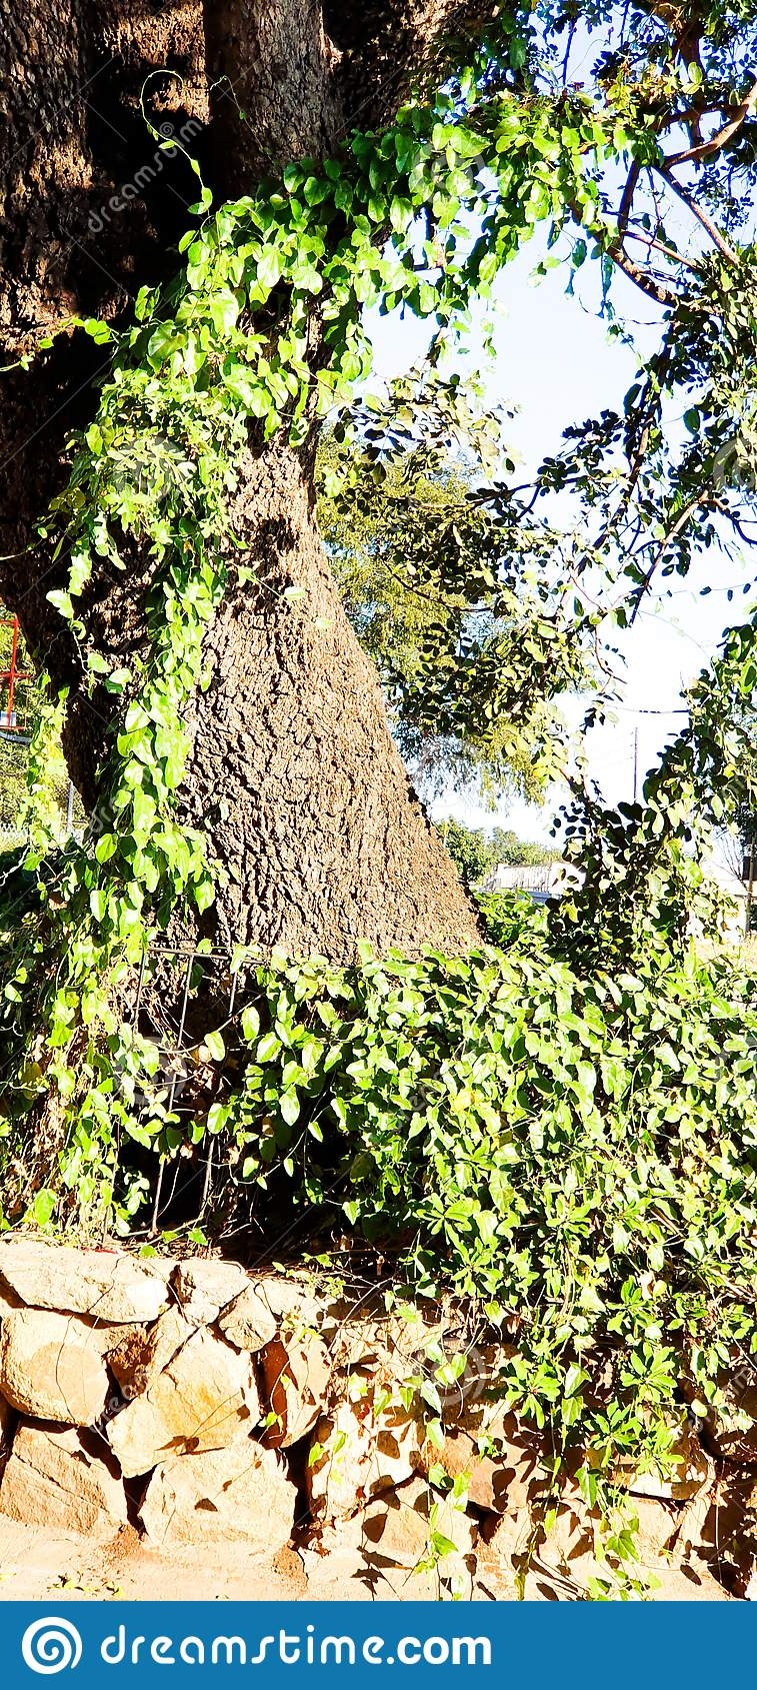 Beaut? verte de l arbre A de nature